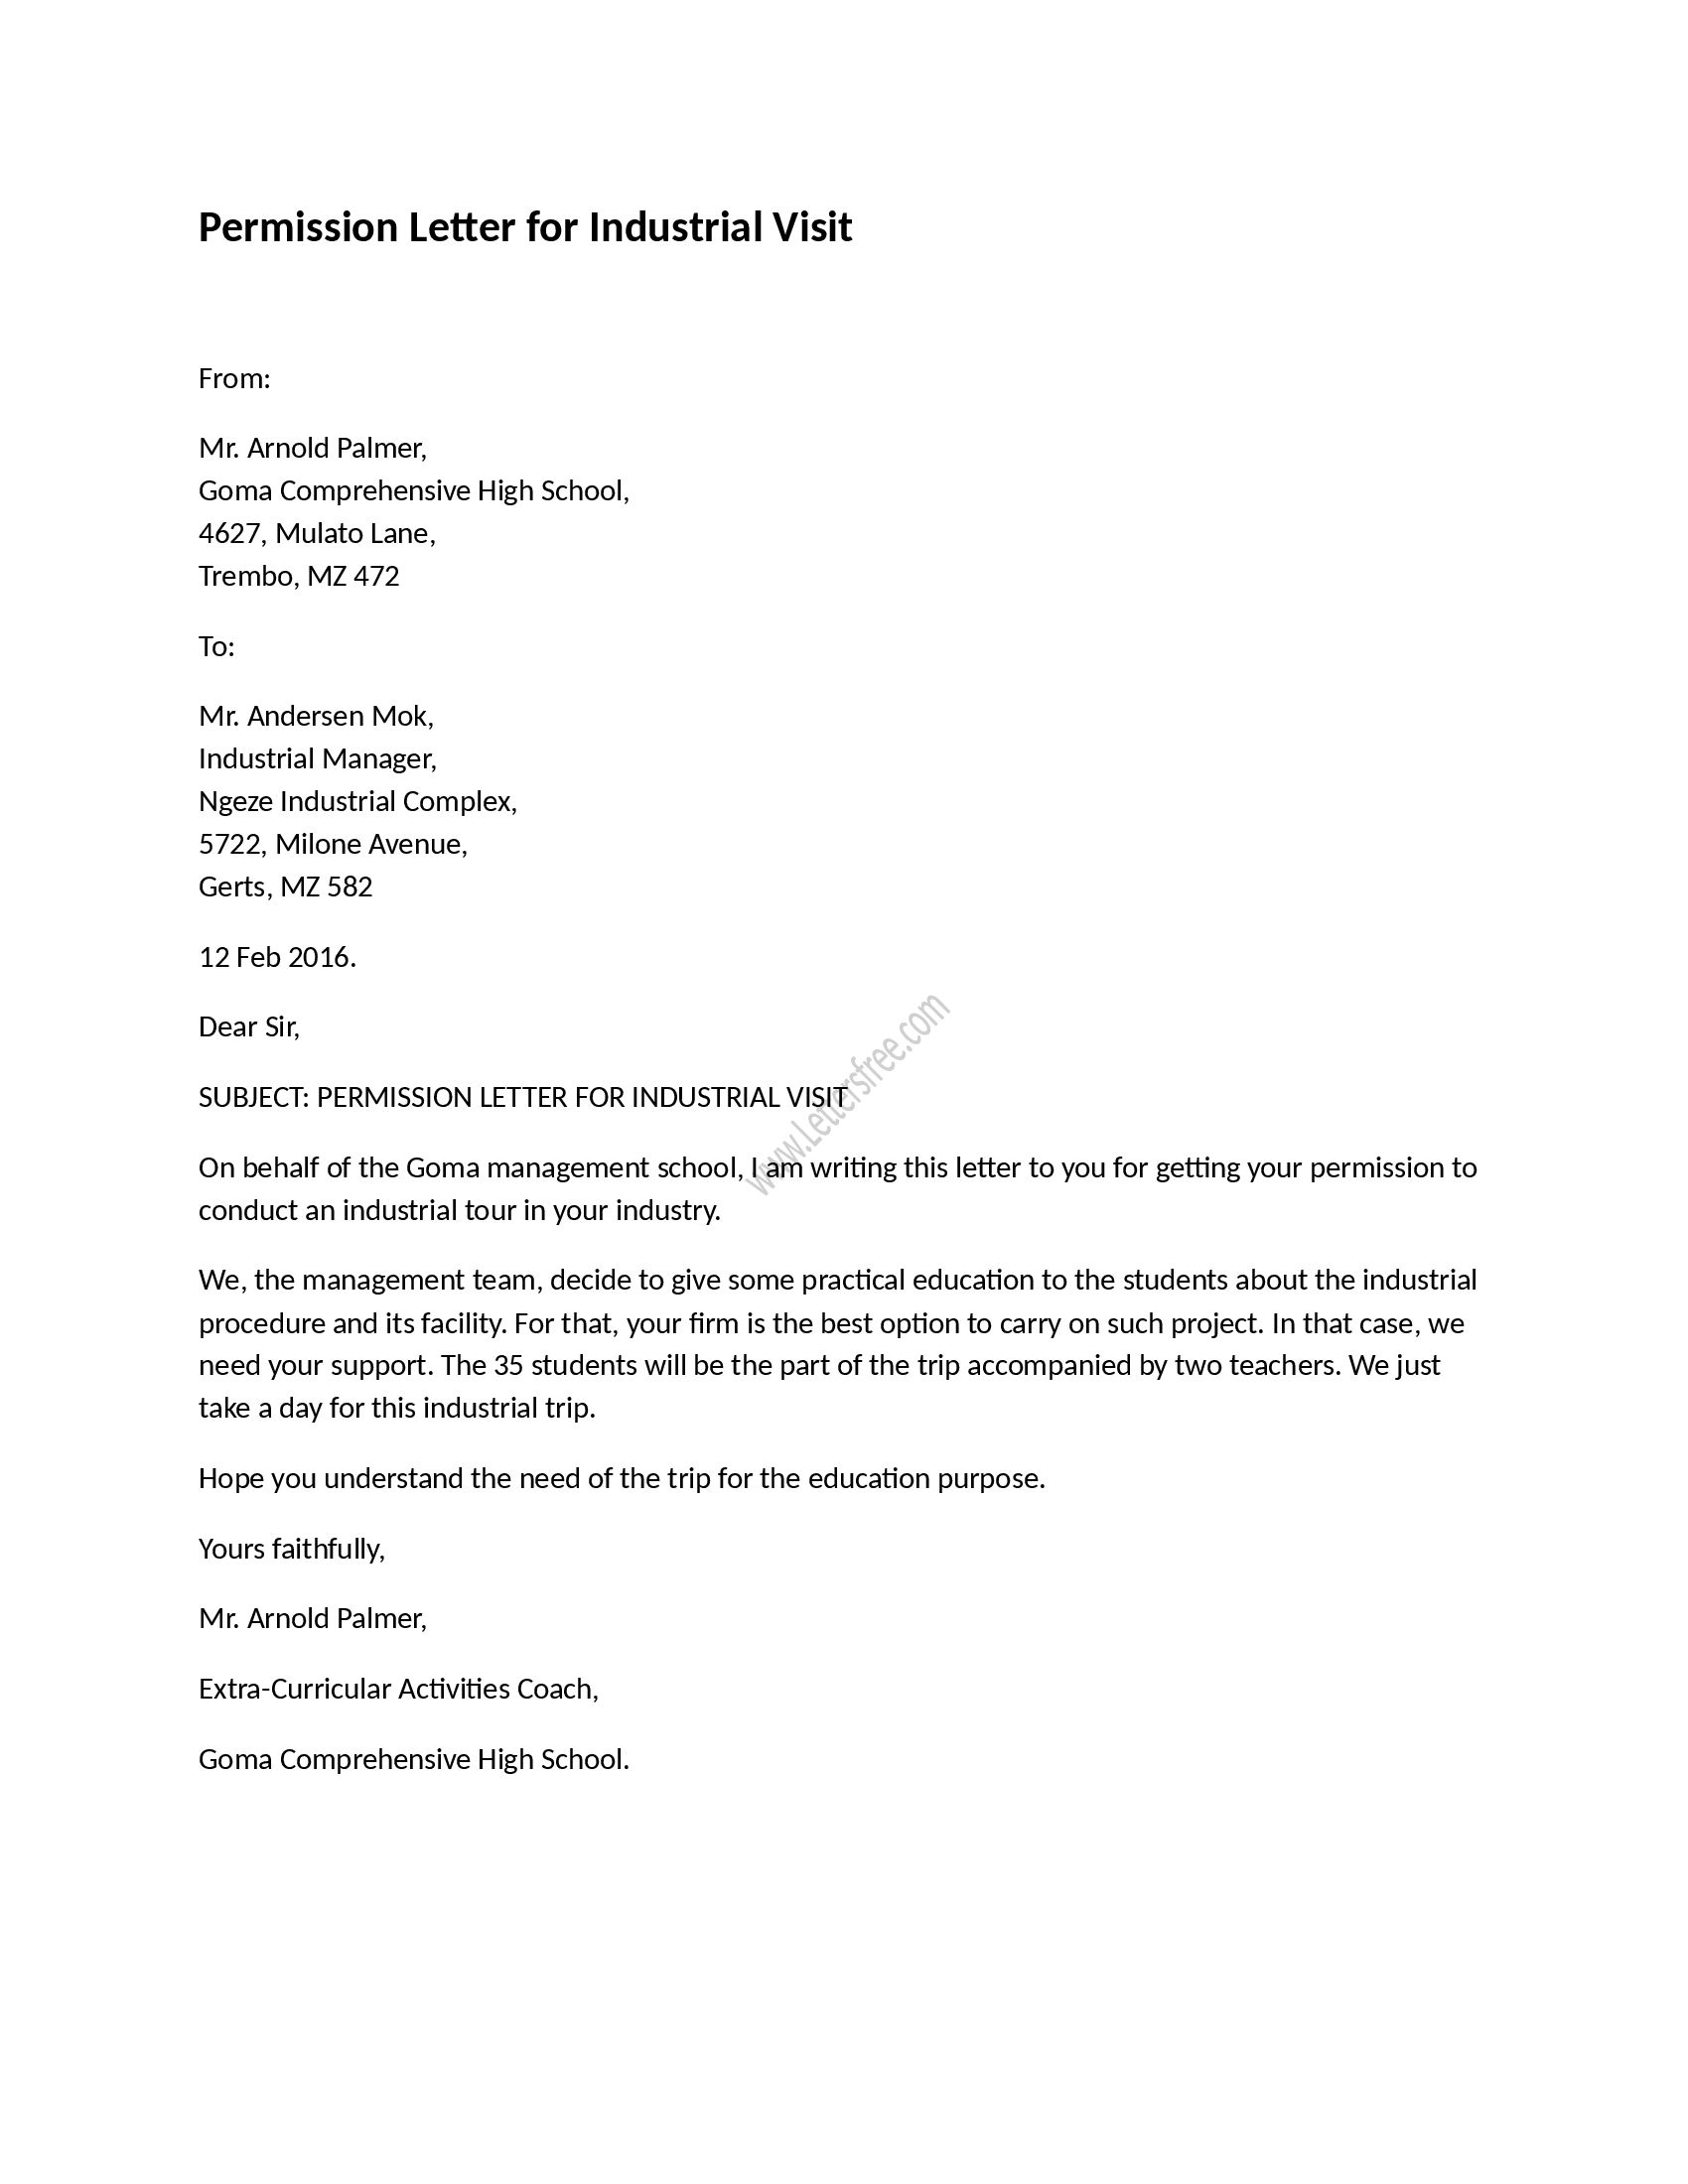 Permission Letter for Industrial Visit  Sample Permission